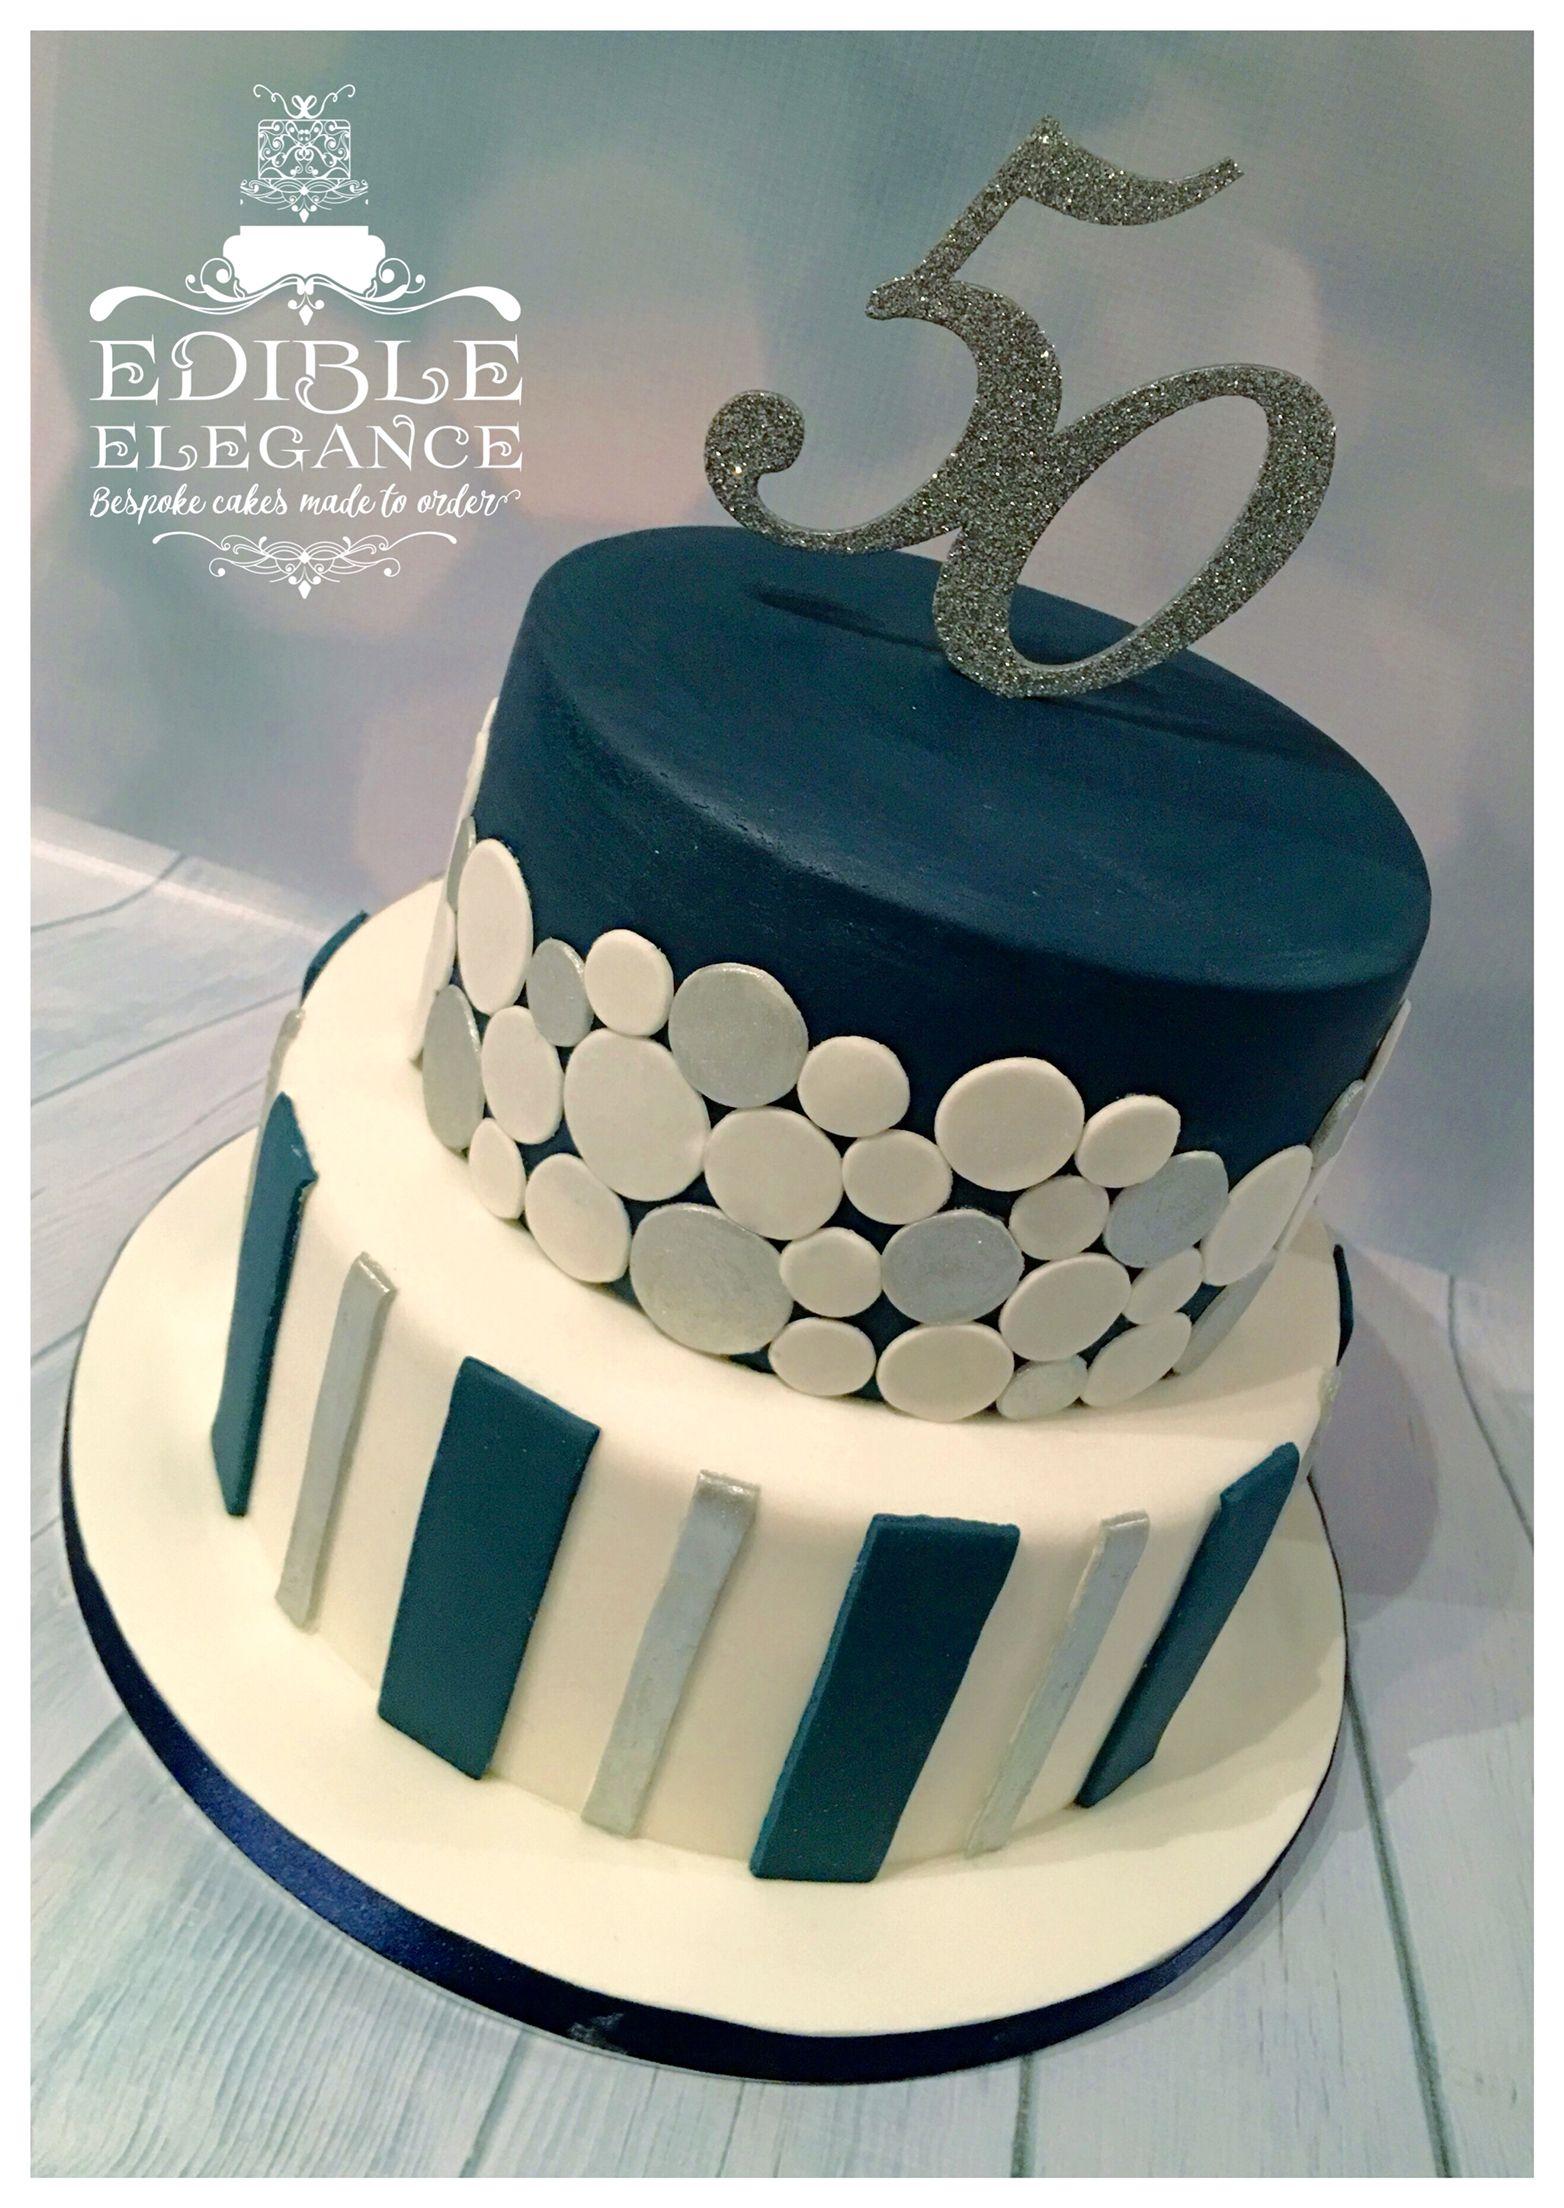 50th Birthday Cake Contemporary Design In Masculine Blue